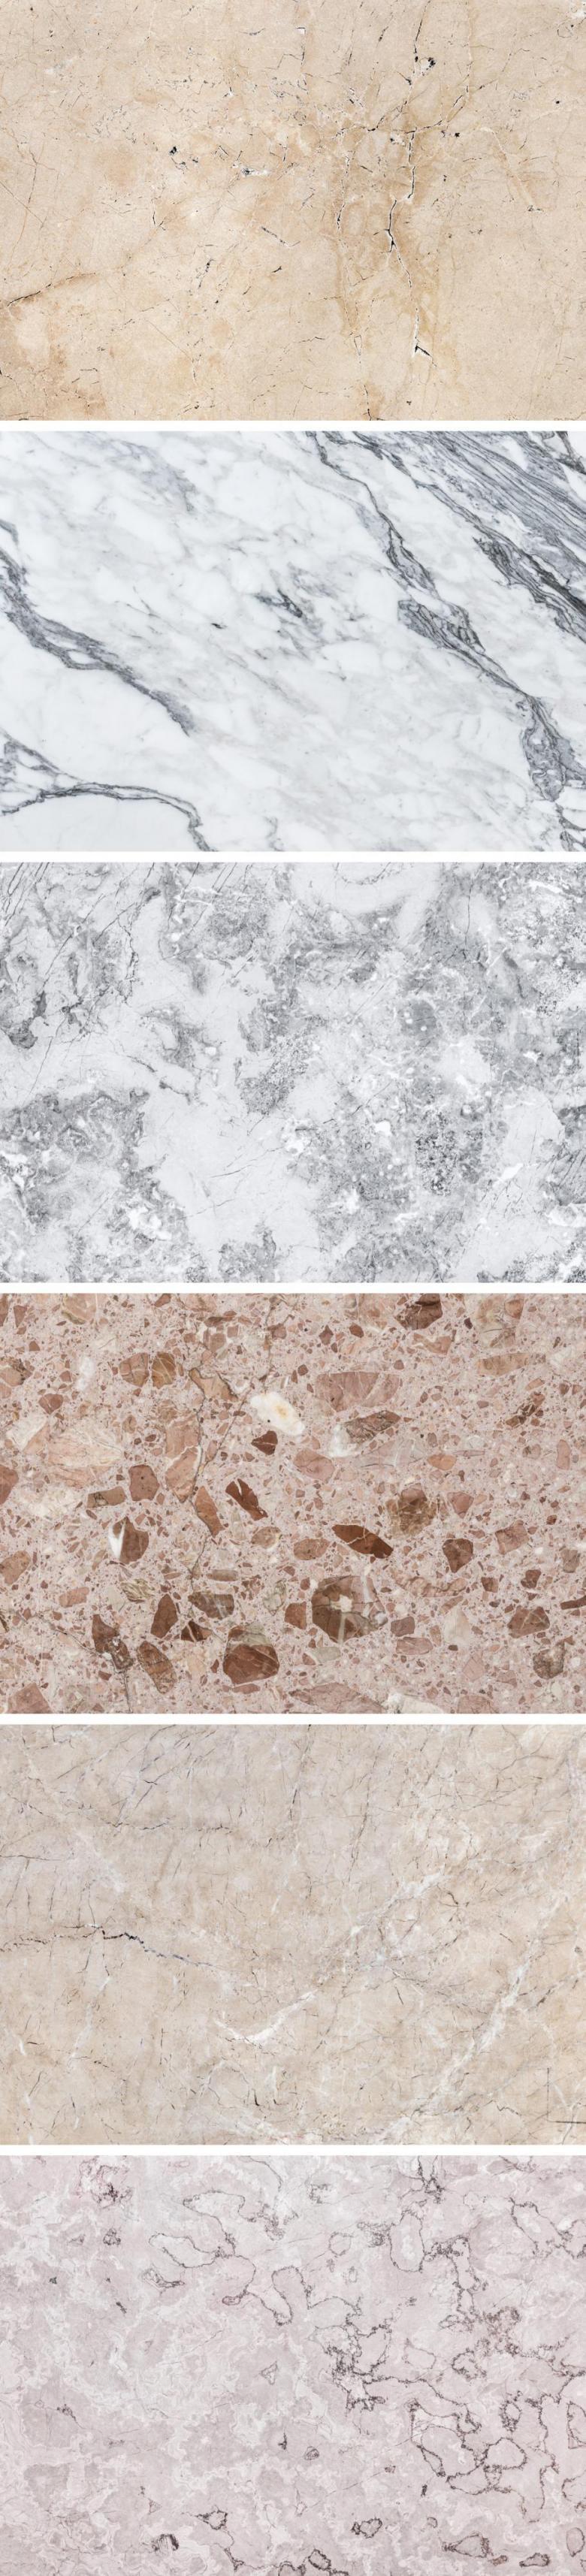 6 Marble Textures Volume 3